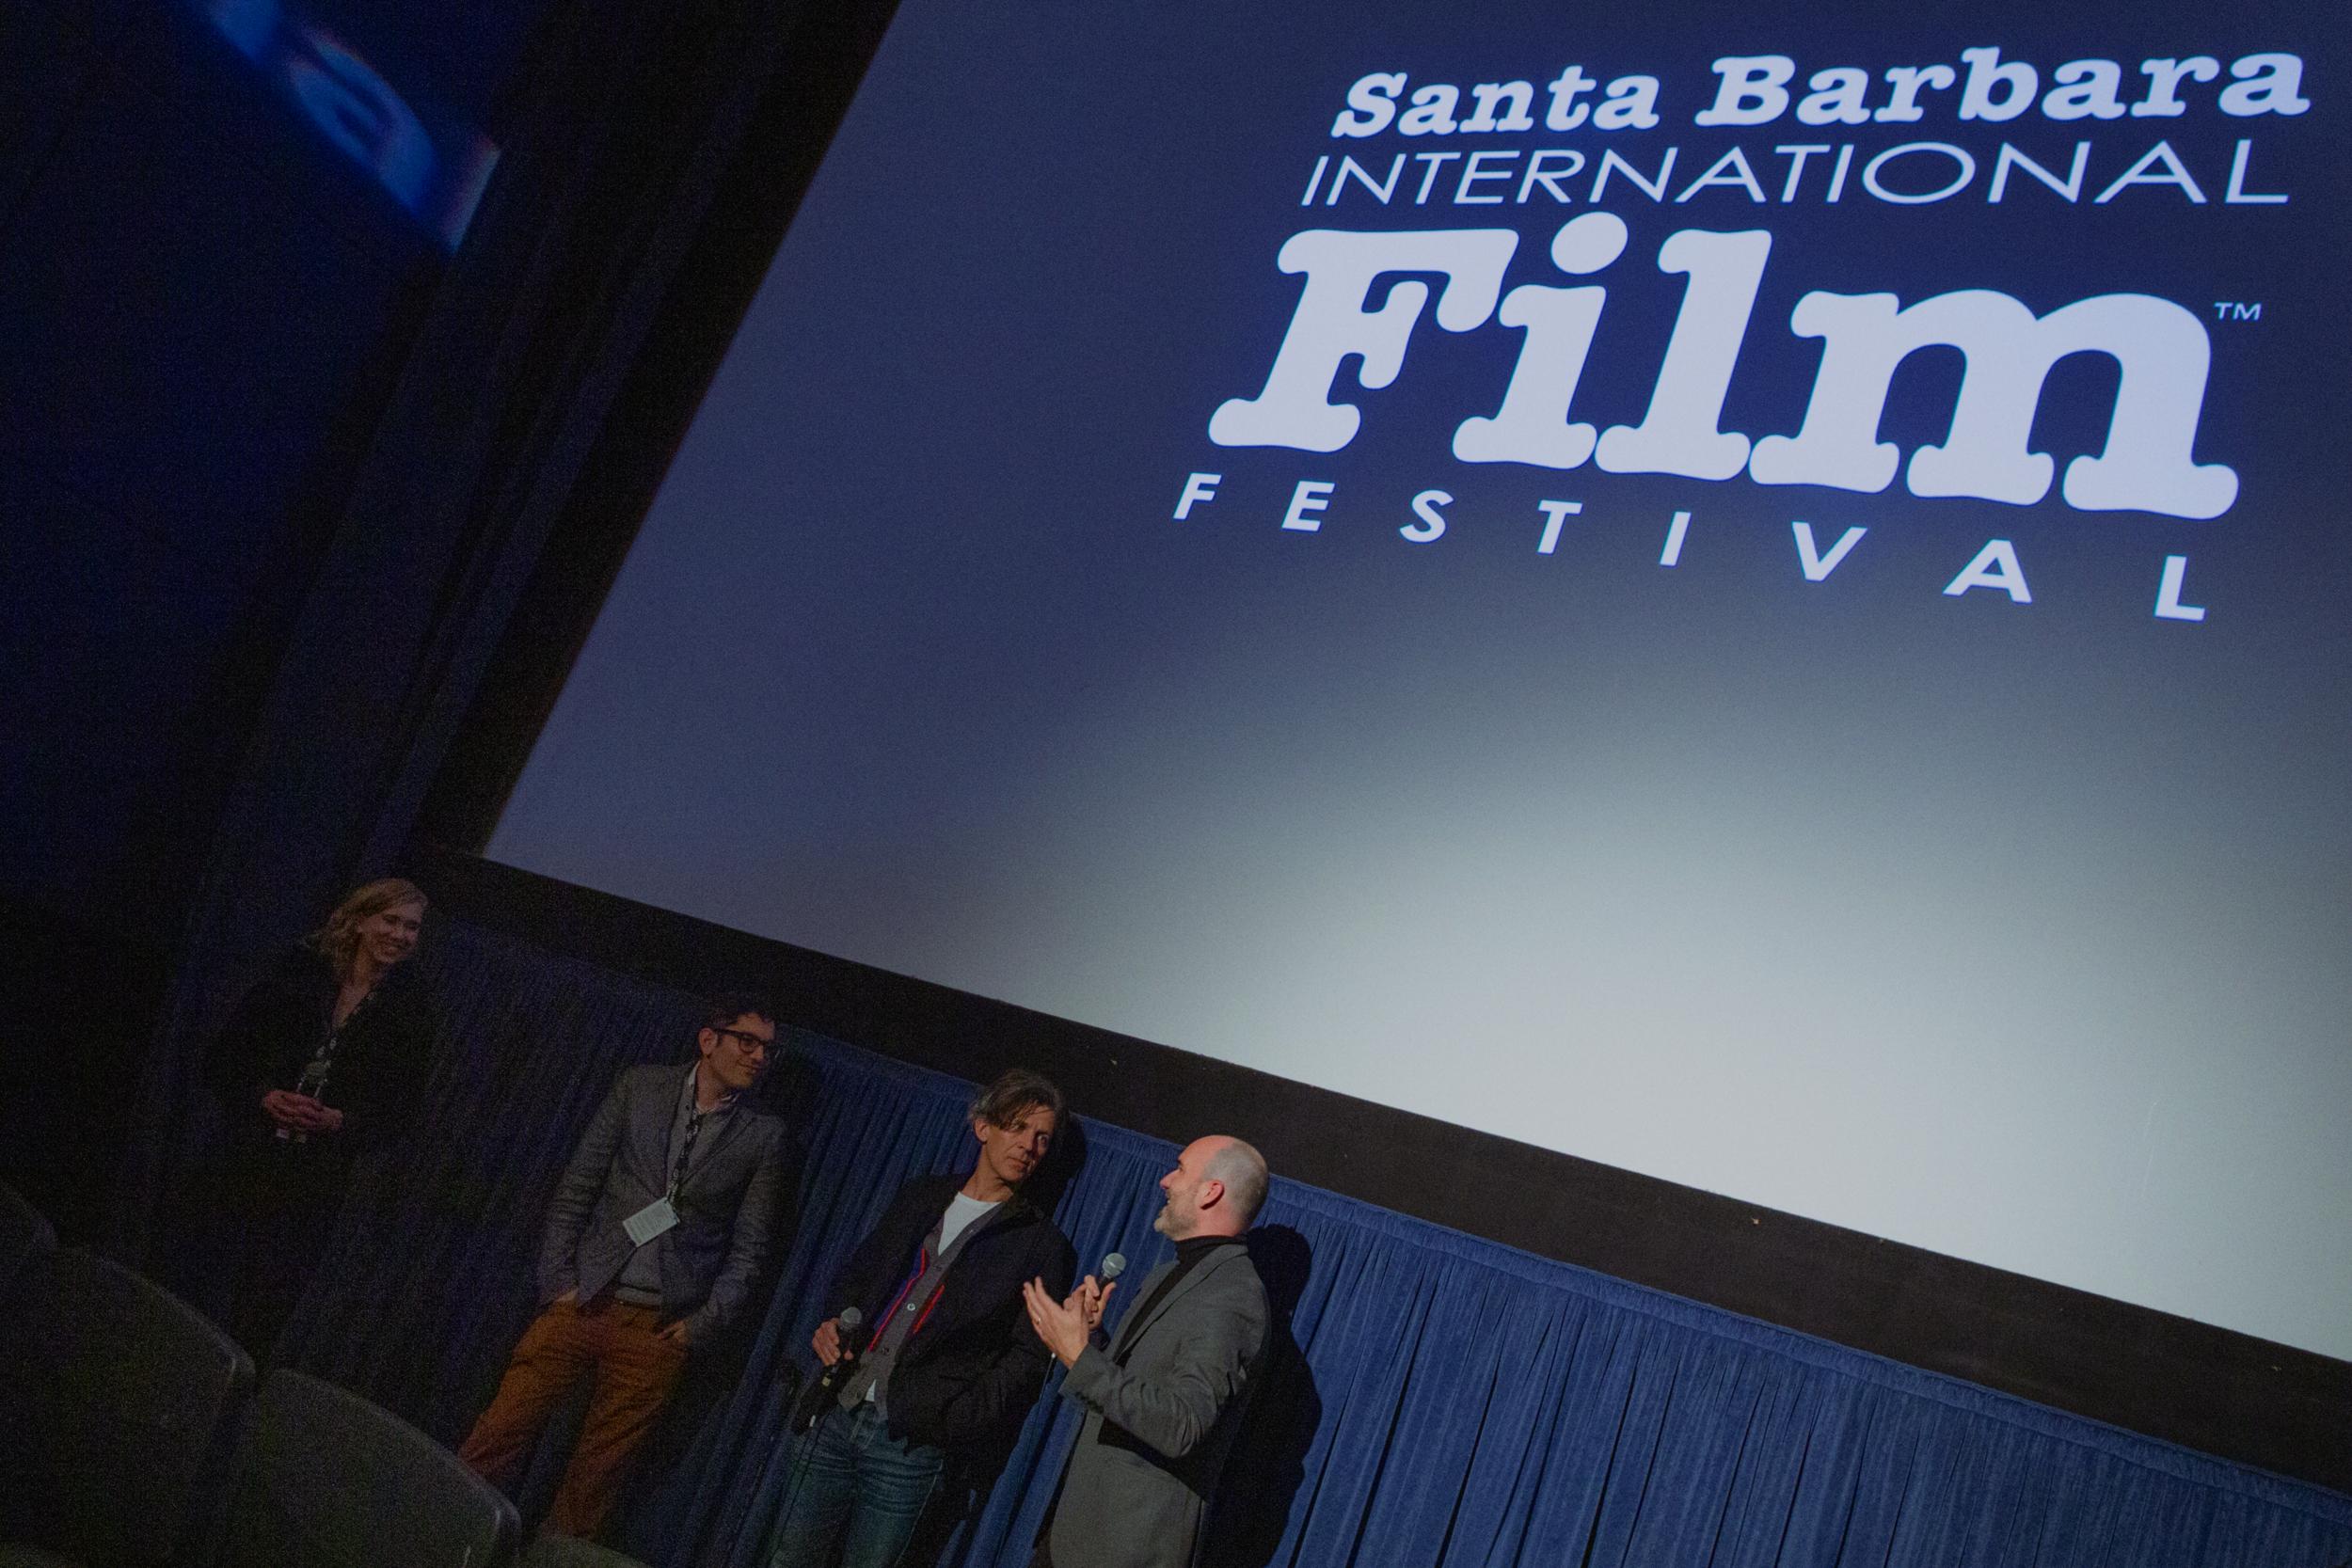 Co-Writer Arbi Pedrossian, Composer Adam Peters & Writer-Director Pascui Rivas at the Santa Barbara International Film Festival Q&A. (Photo by @ClovisIV)